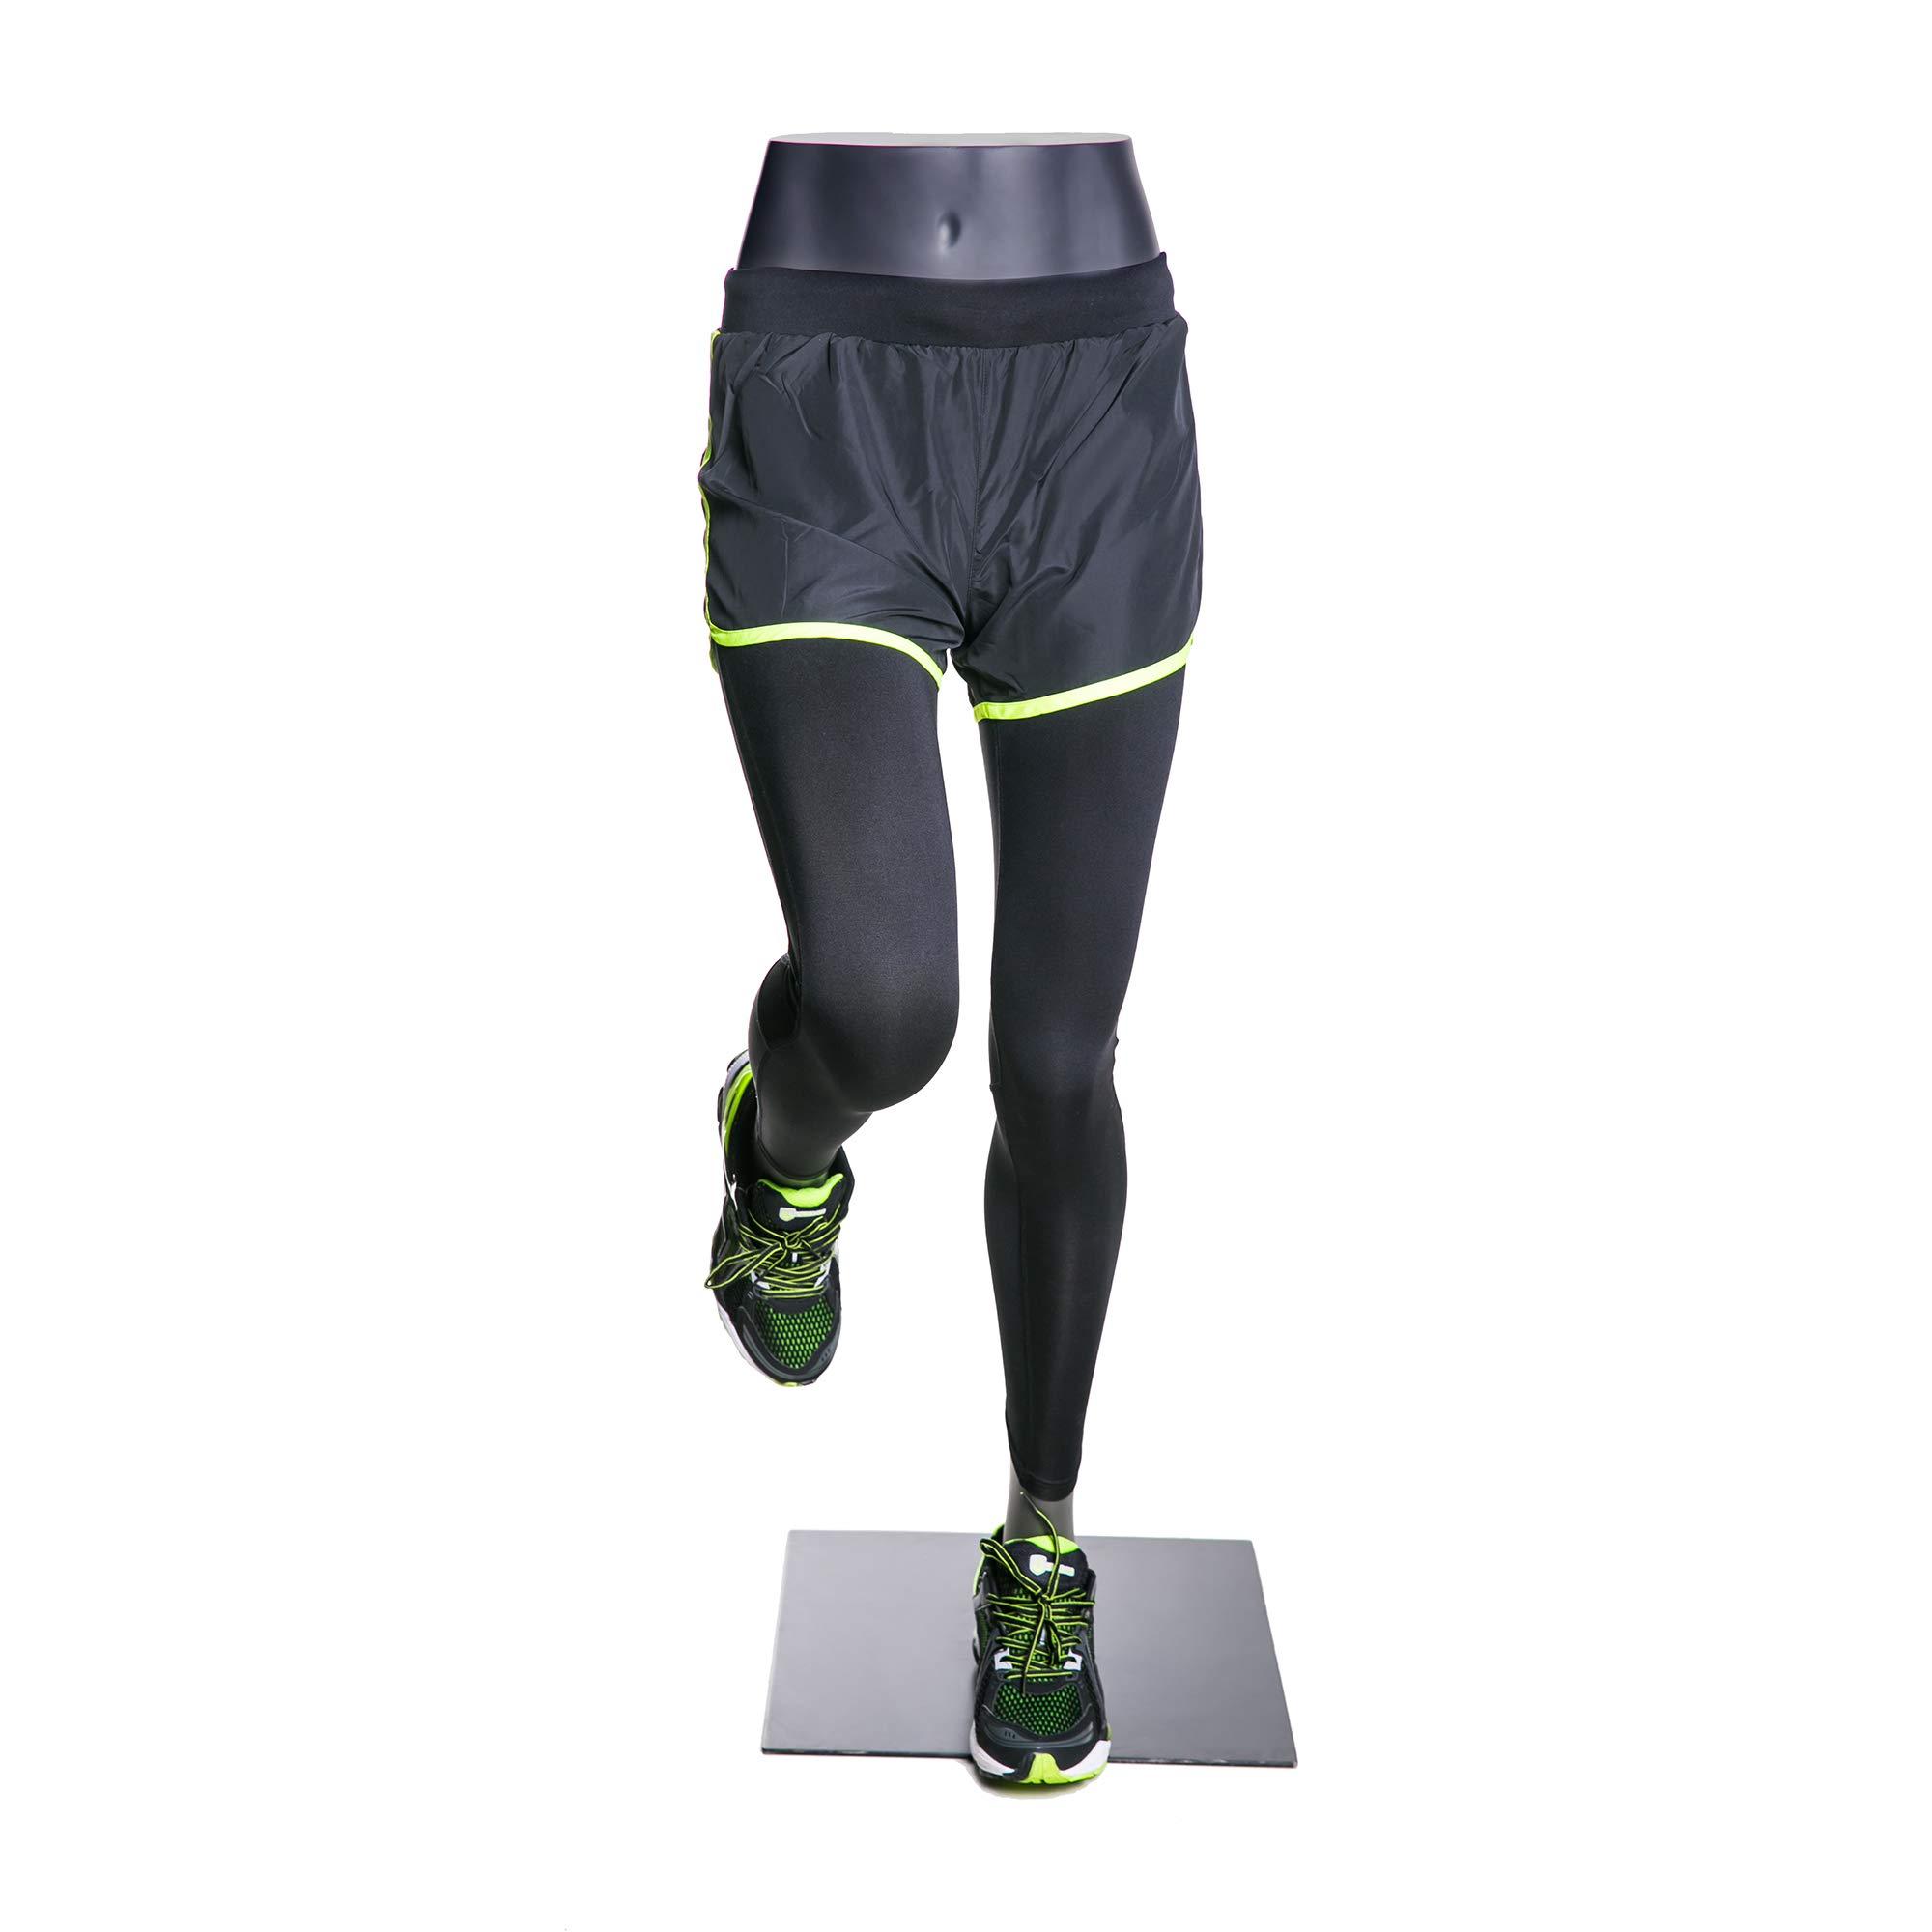 (MZ-HEF51LEG) High end Quality. Eye Catching Female Headless Mannequin Leg, Athletic Style. Running Pose.